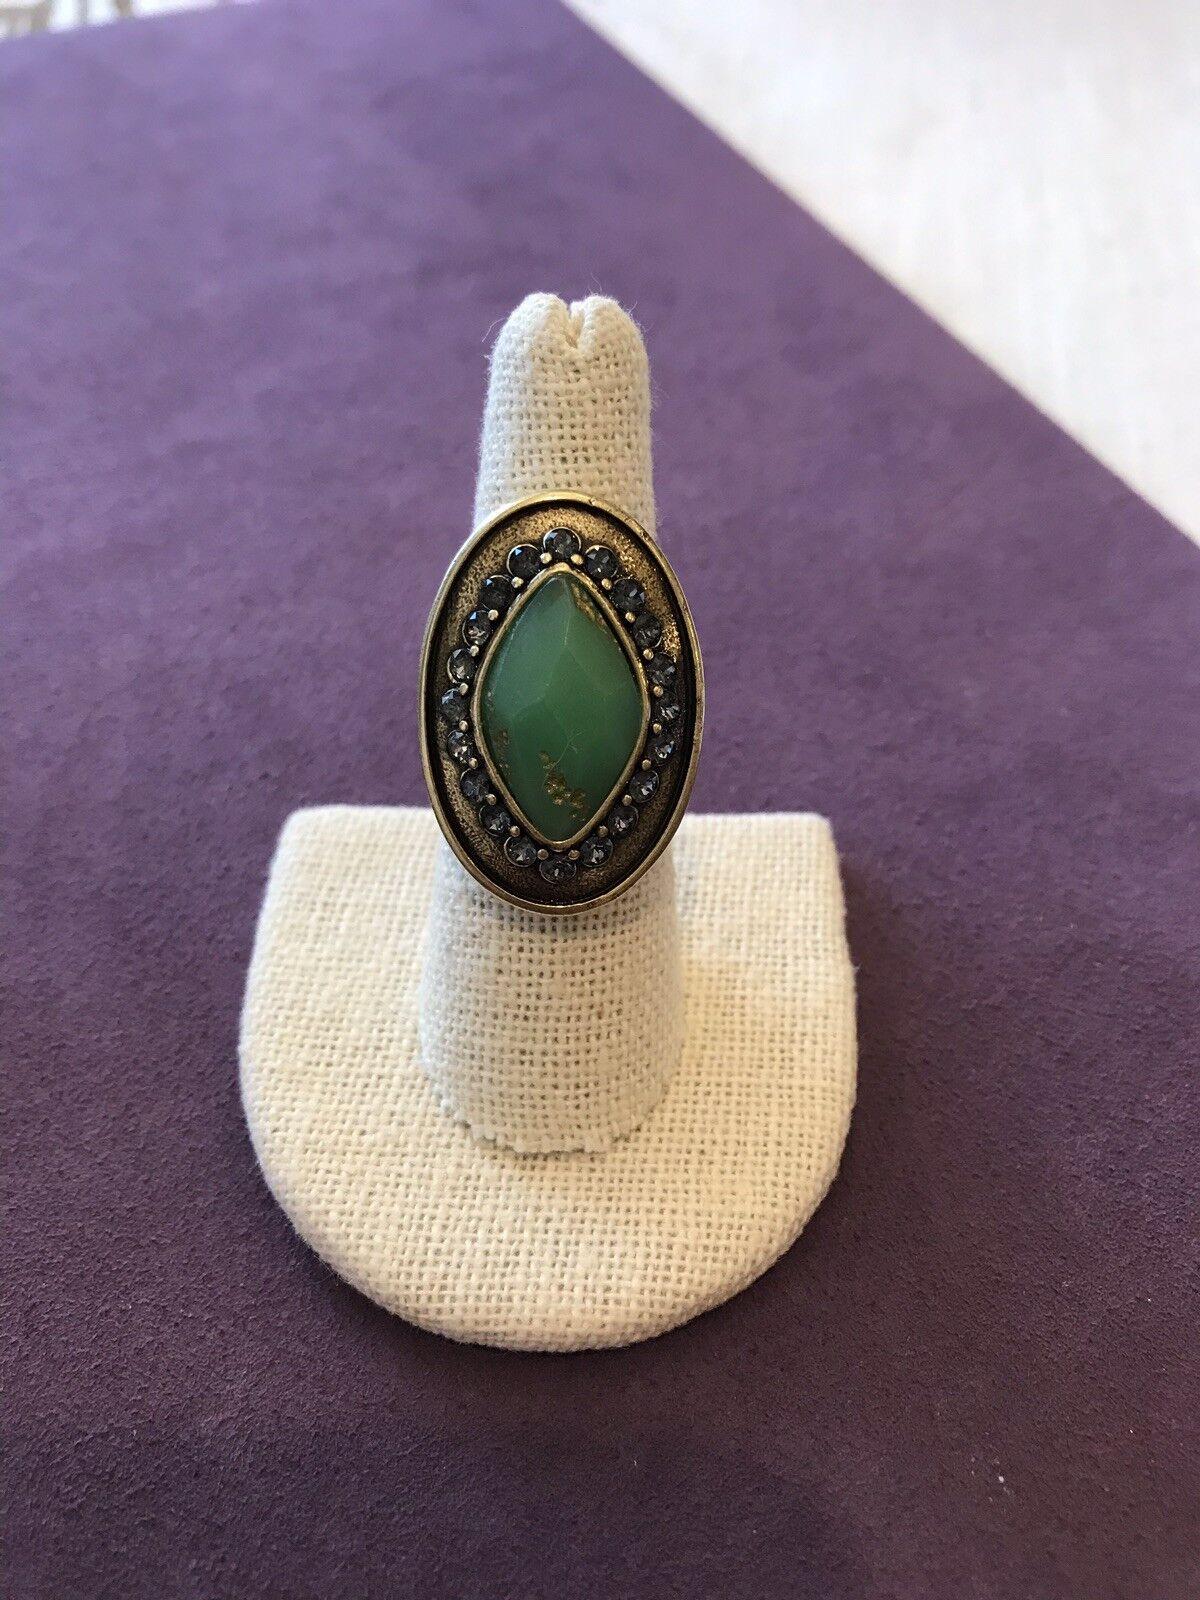 KRR0072 Silpada Designs Botanical Ring Size 7